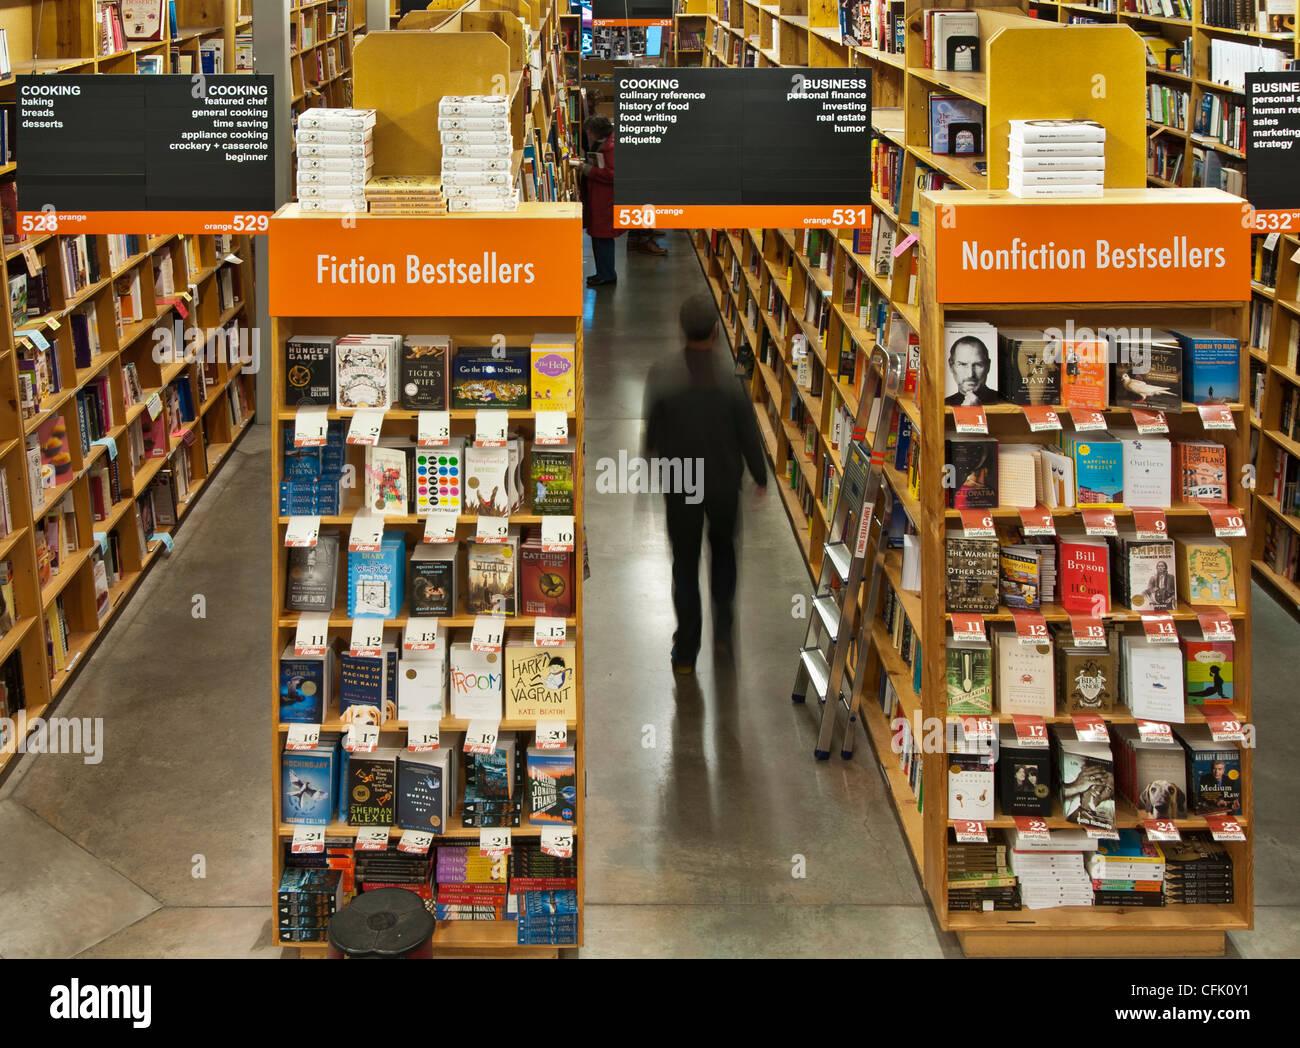 Powell's City of Books bookstore in Portland, Oregon. - Stock Image